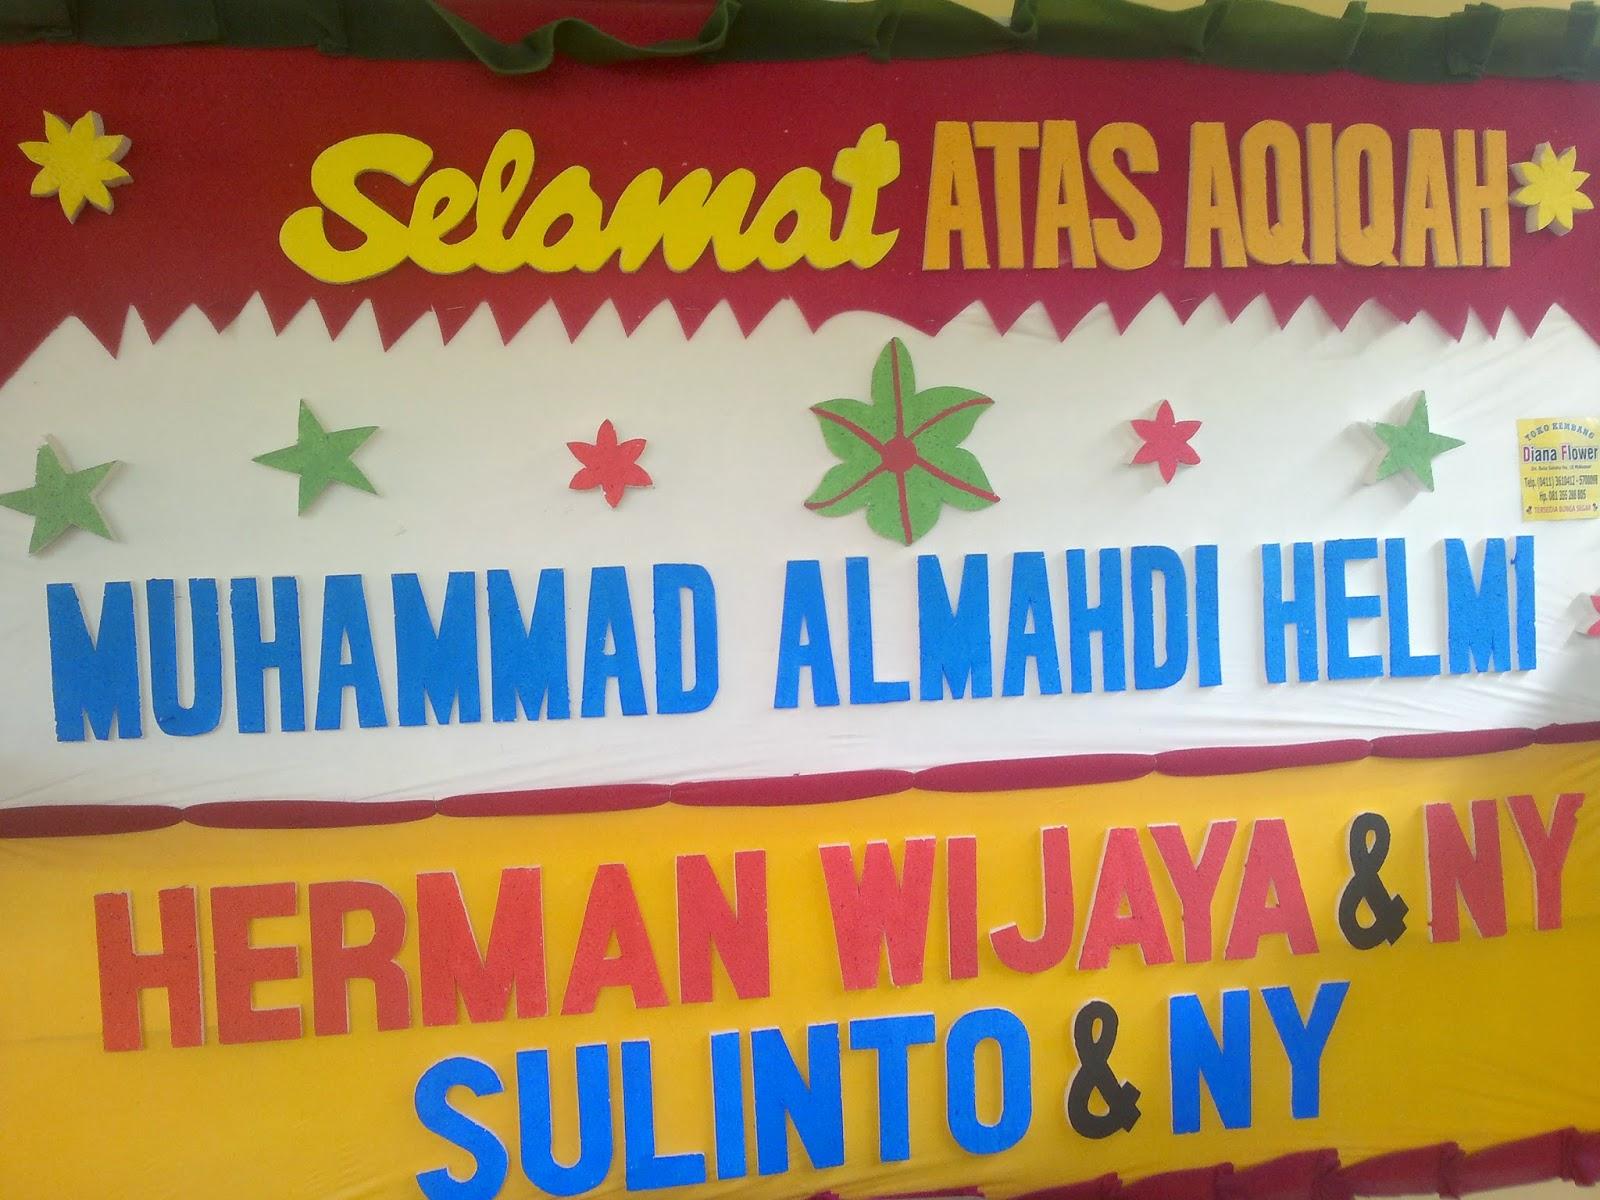 Selamat Aqiqah Muhammad Almahdi Helmi